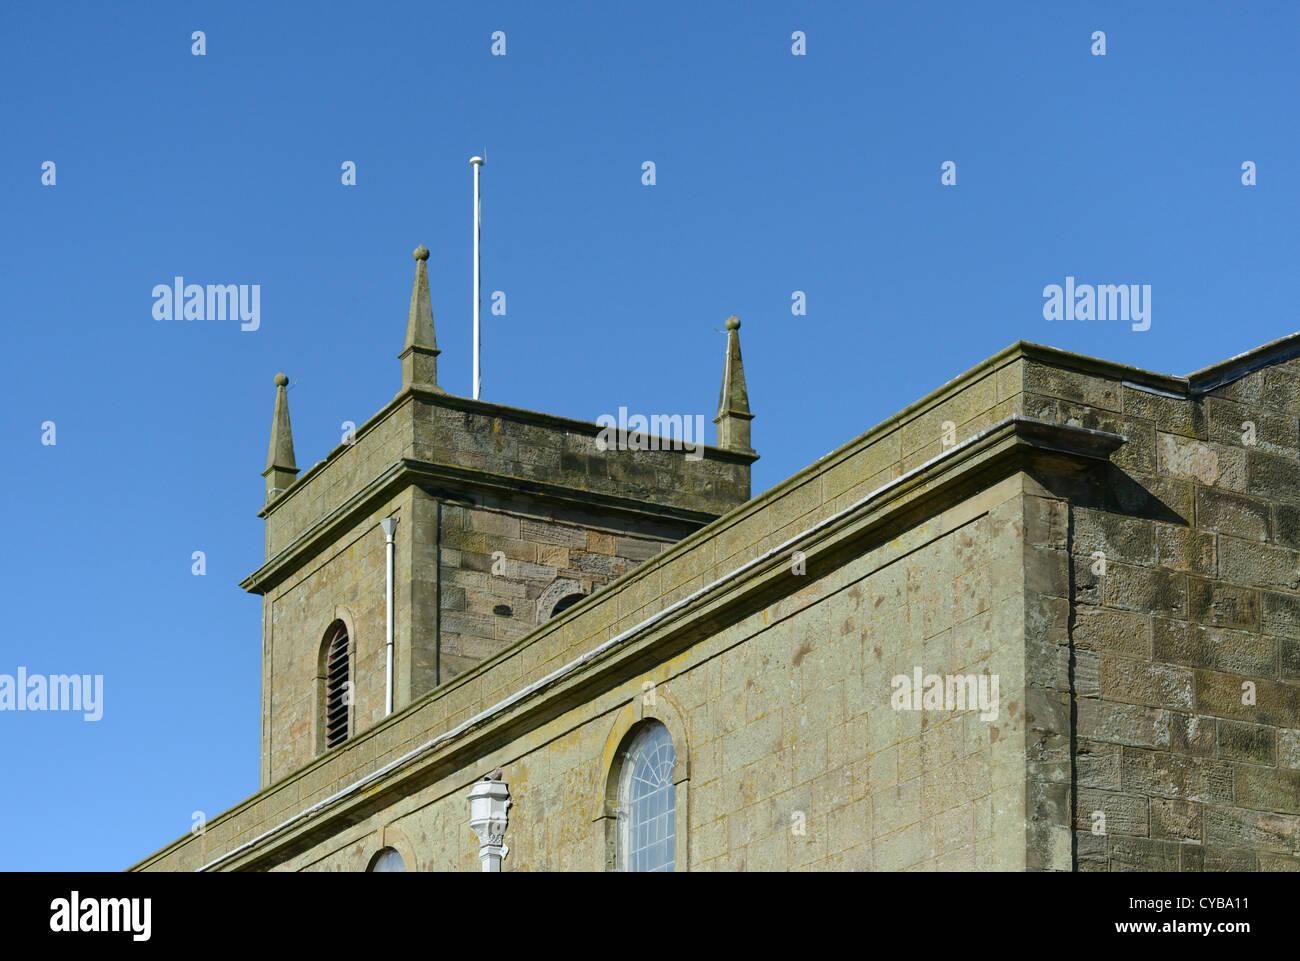 Church of Saint Bridget (detail). Moresby, Cumbria, England, United Kingdom, Europe. - Stock Image